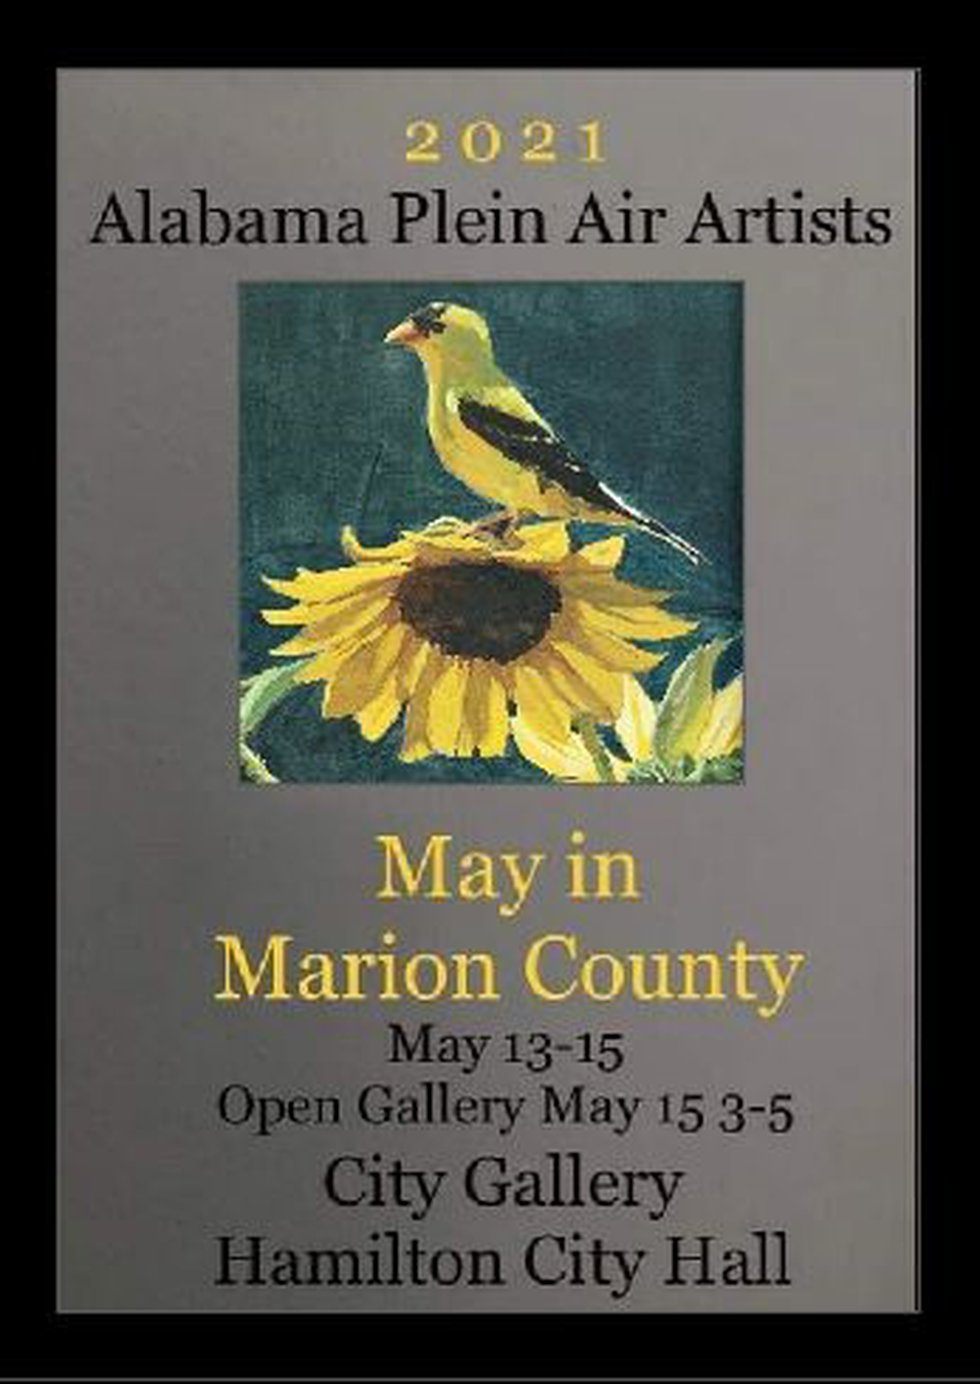 Alabama Plein Air Artists.